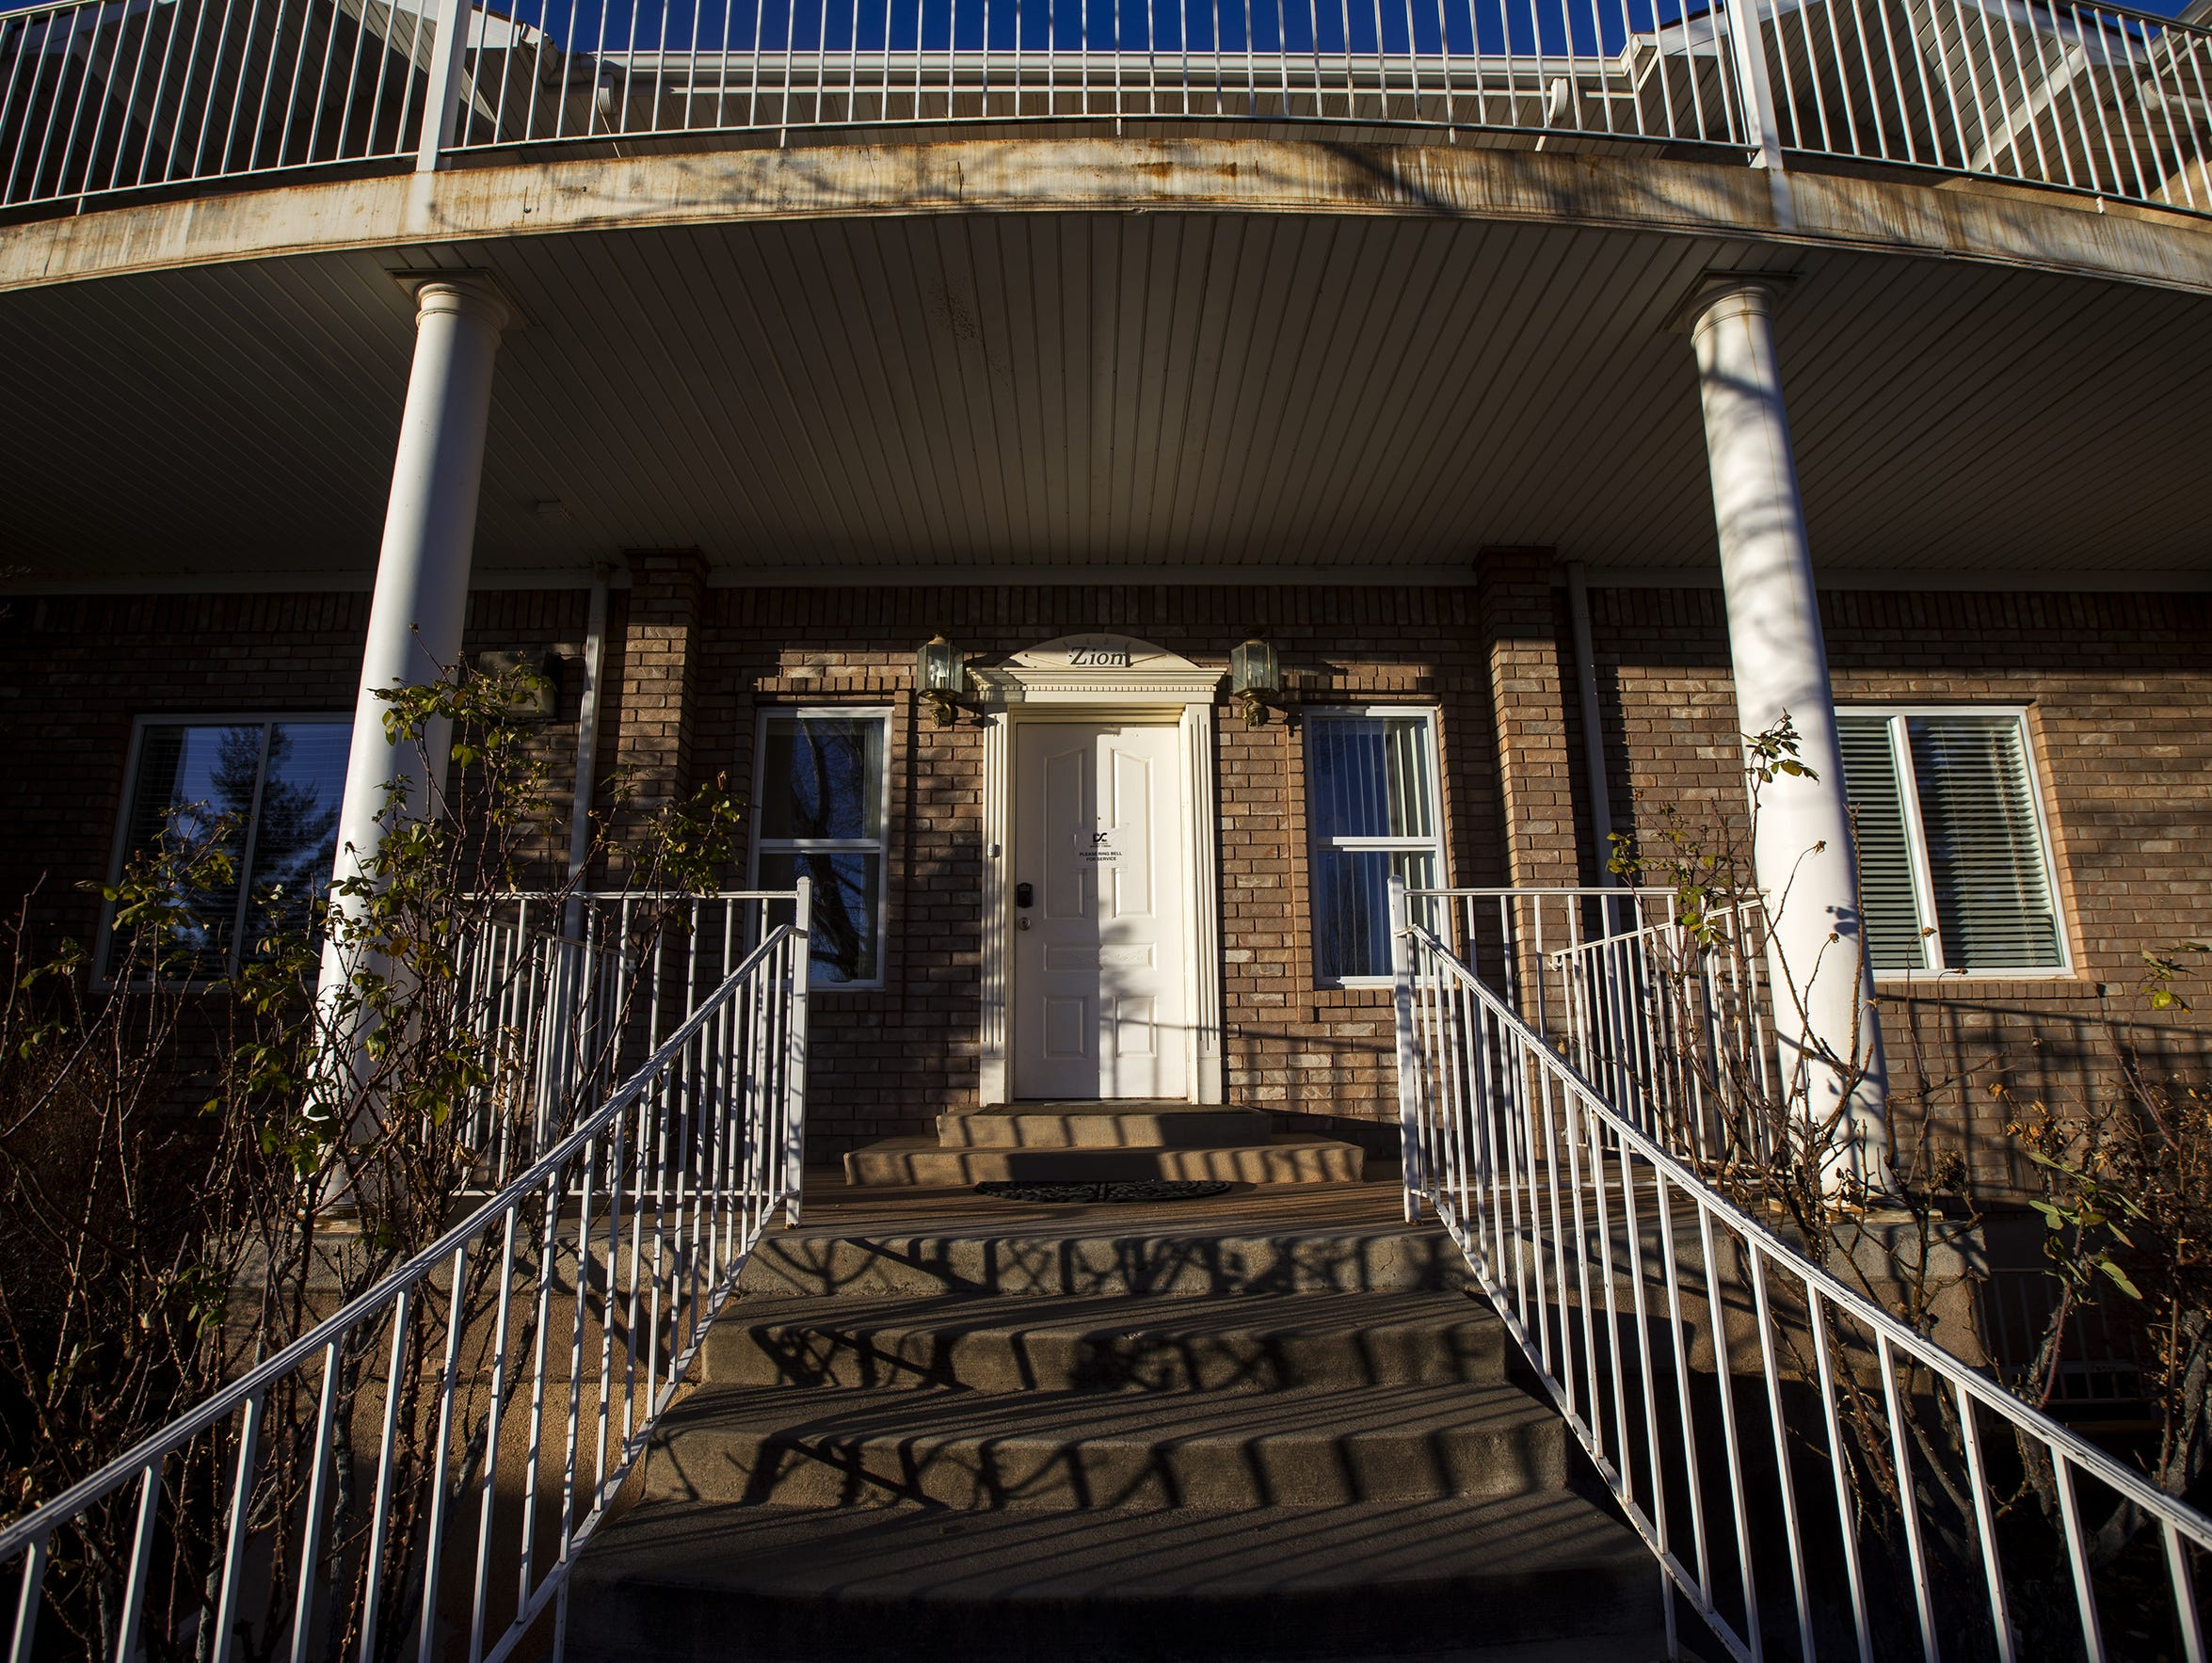 Warren Jeffs' former home in Short Creek was auctioned